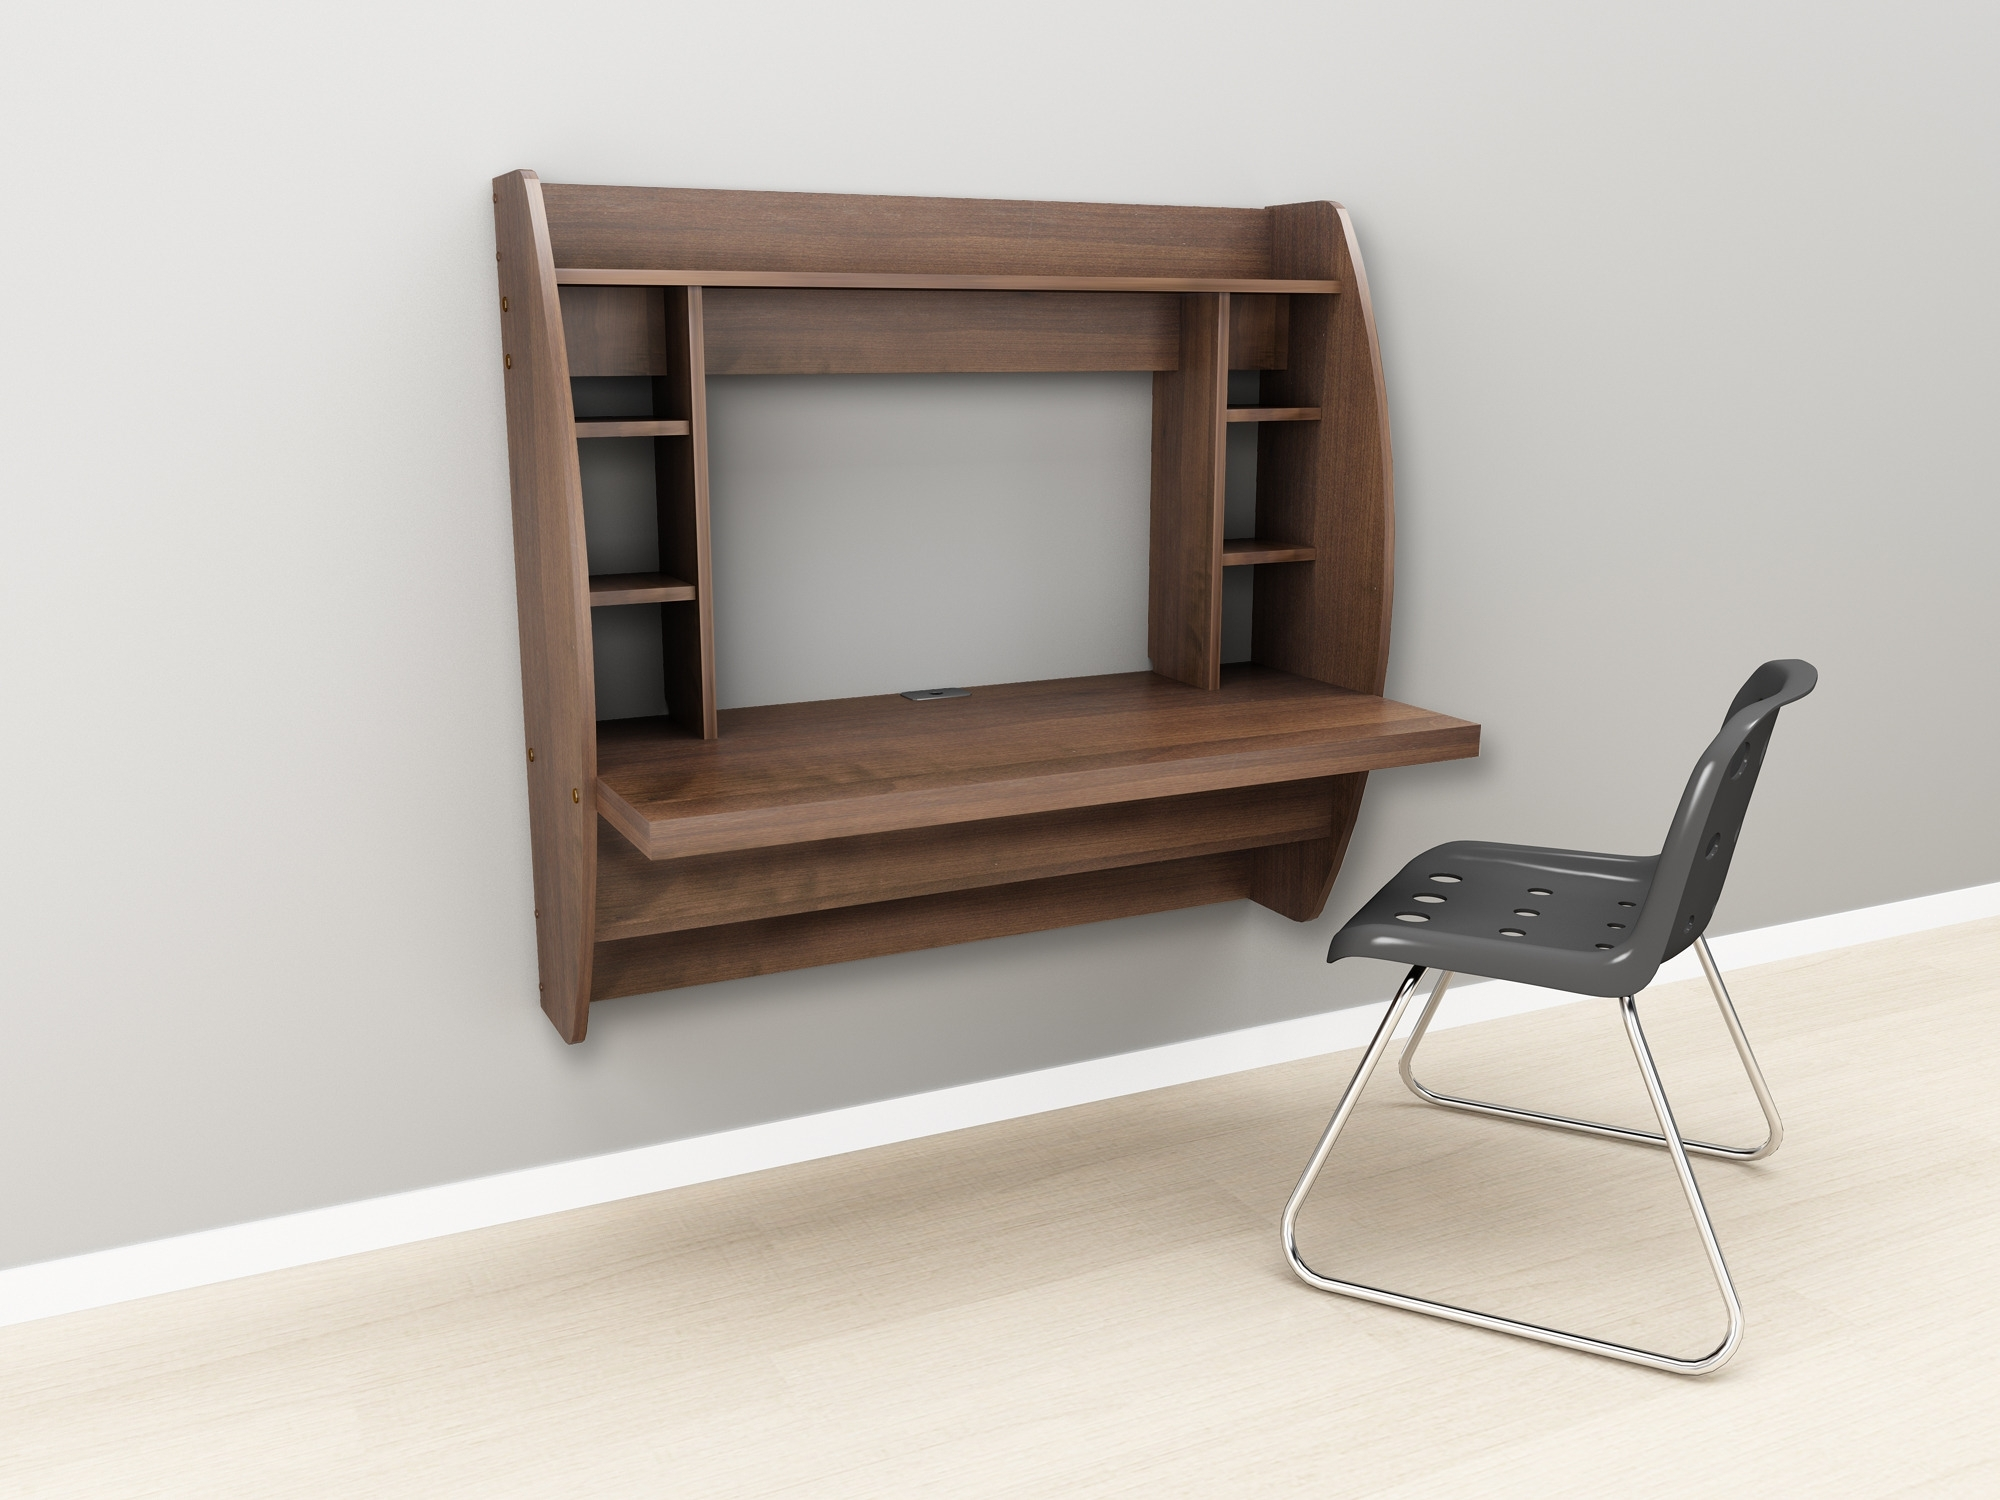 wall mounted art desk photo - 6